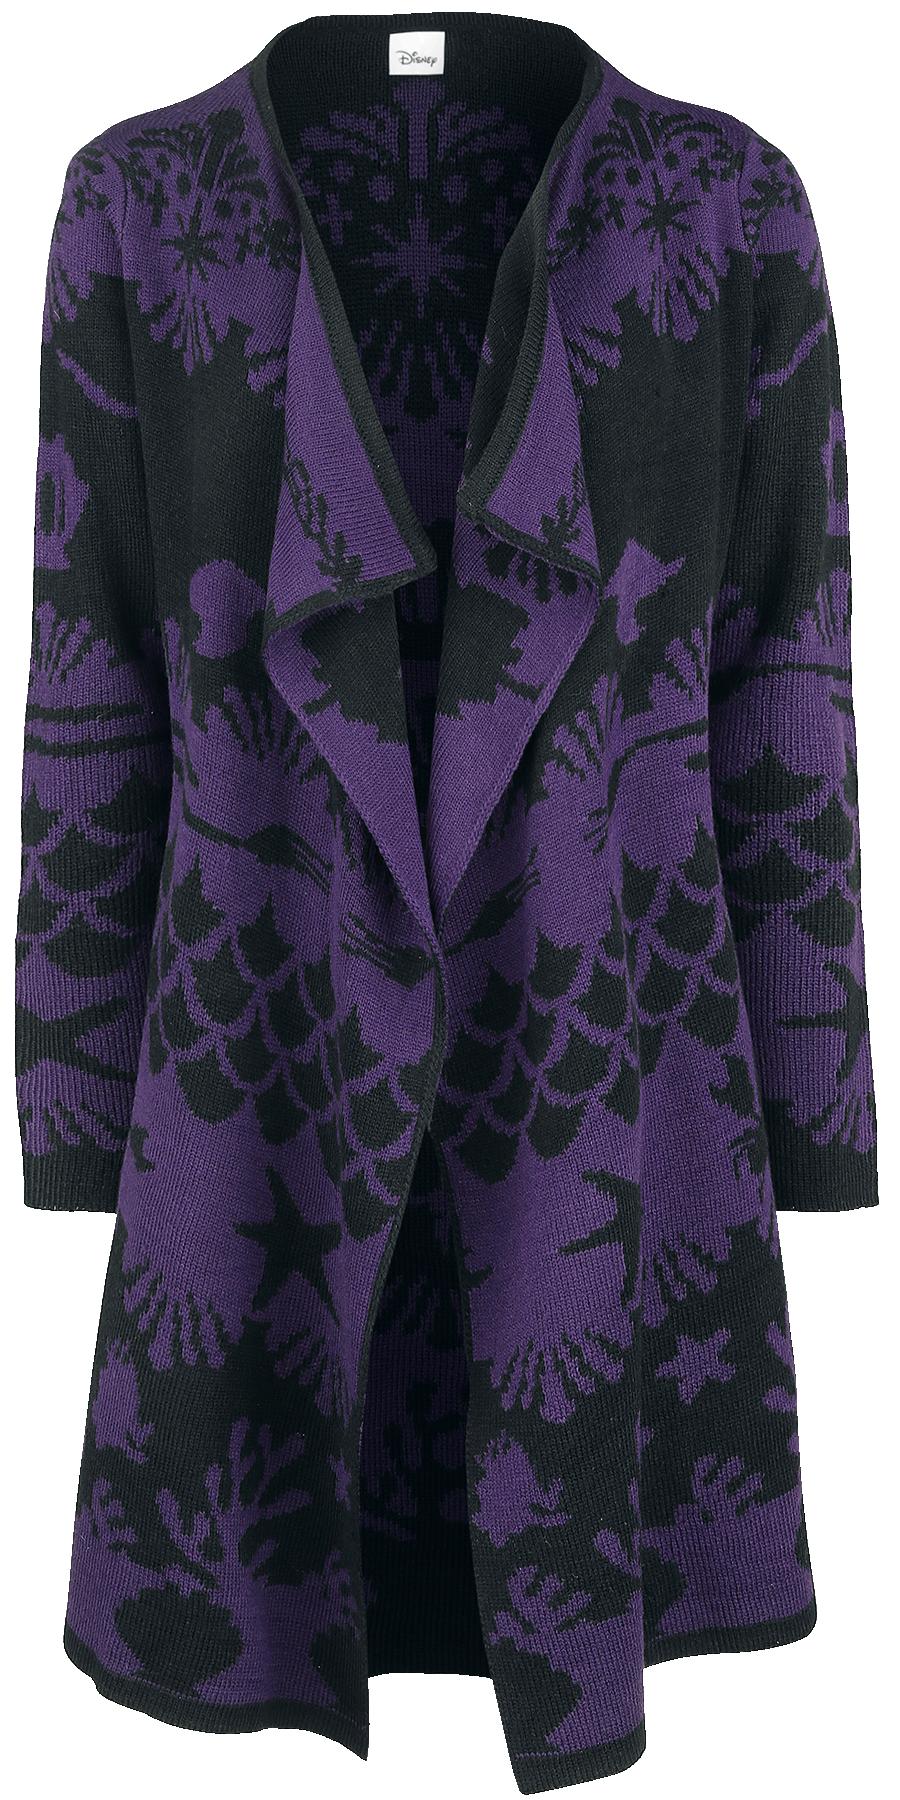 The Little Mermaid - Under Water - Girls' cardigan - purple-black image